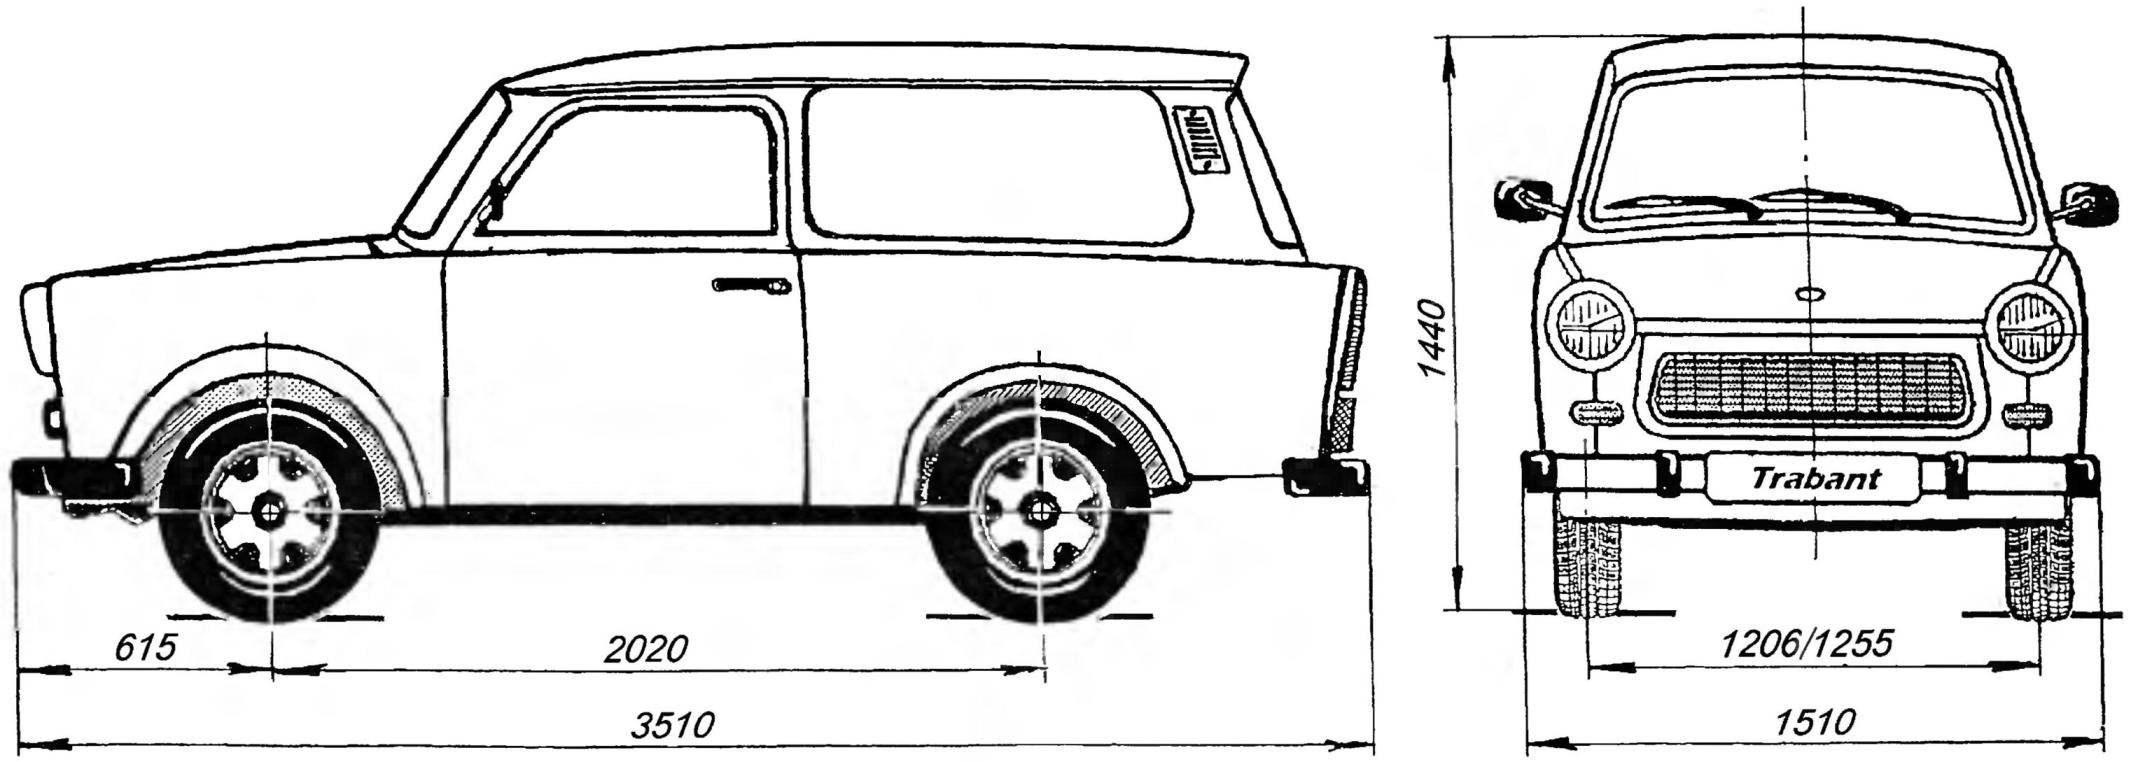 Общий вид трёхдверного автомобиля Trabant Р601 Kombi (универсал)